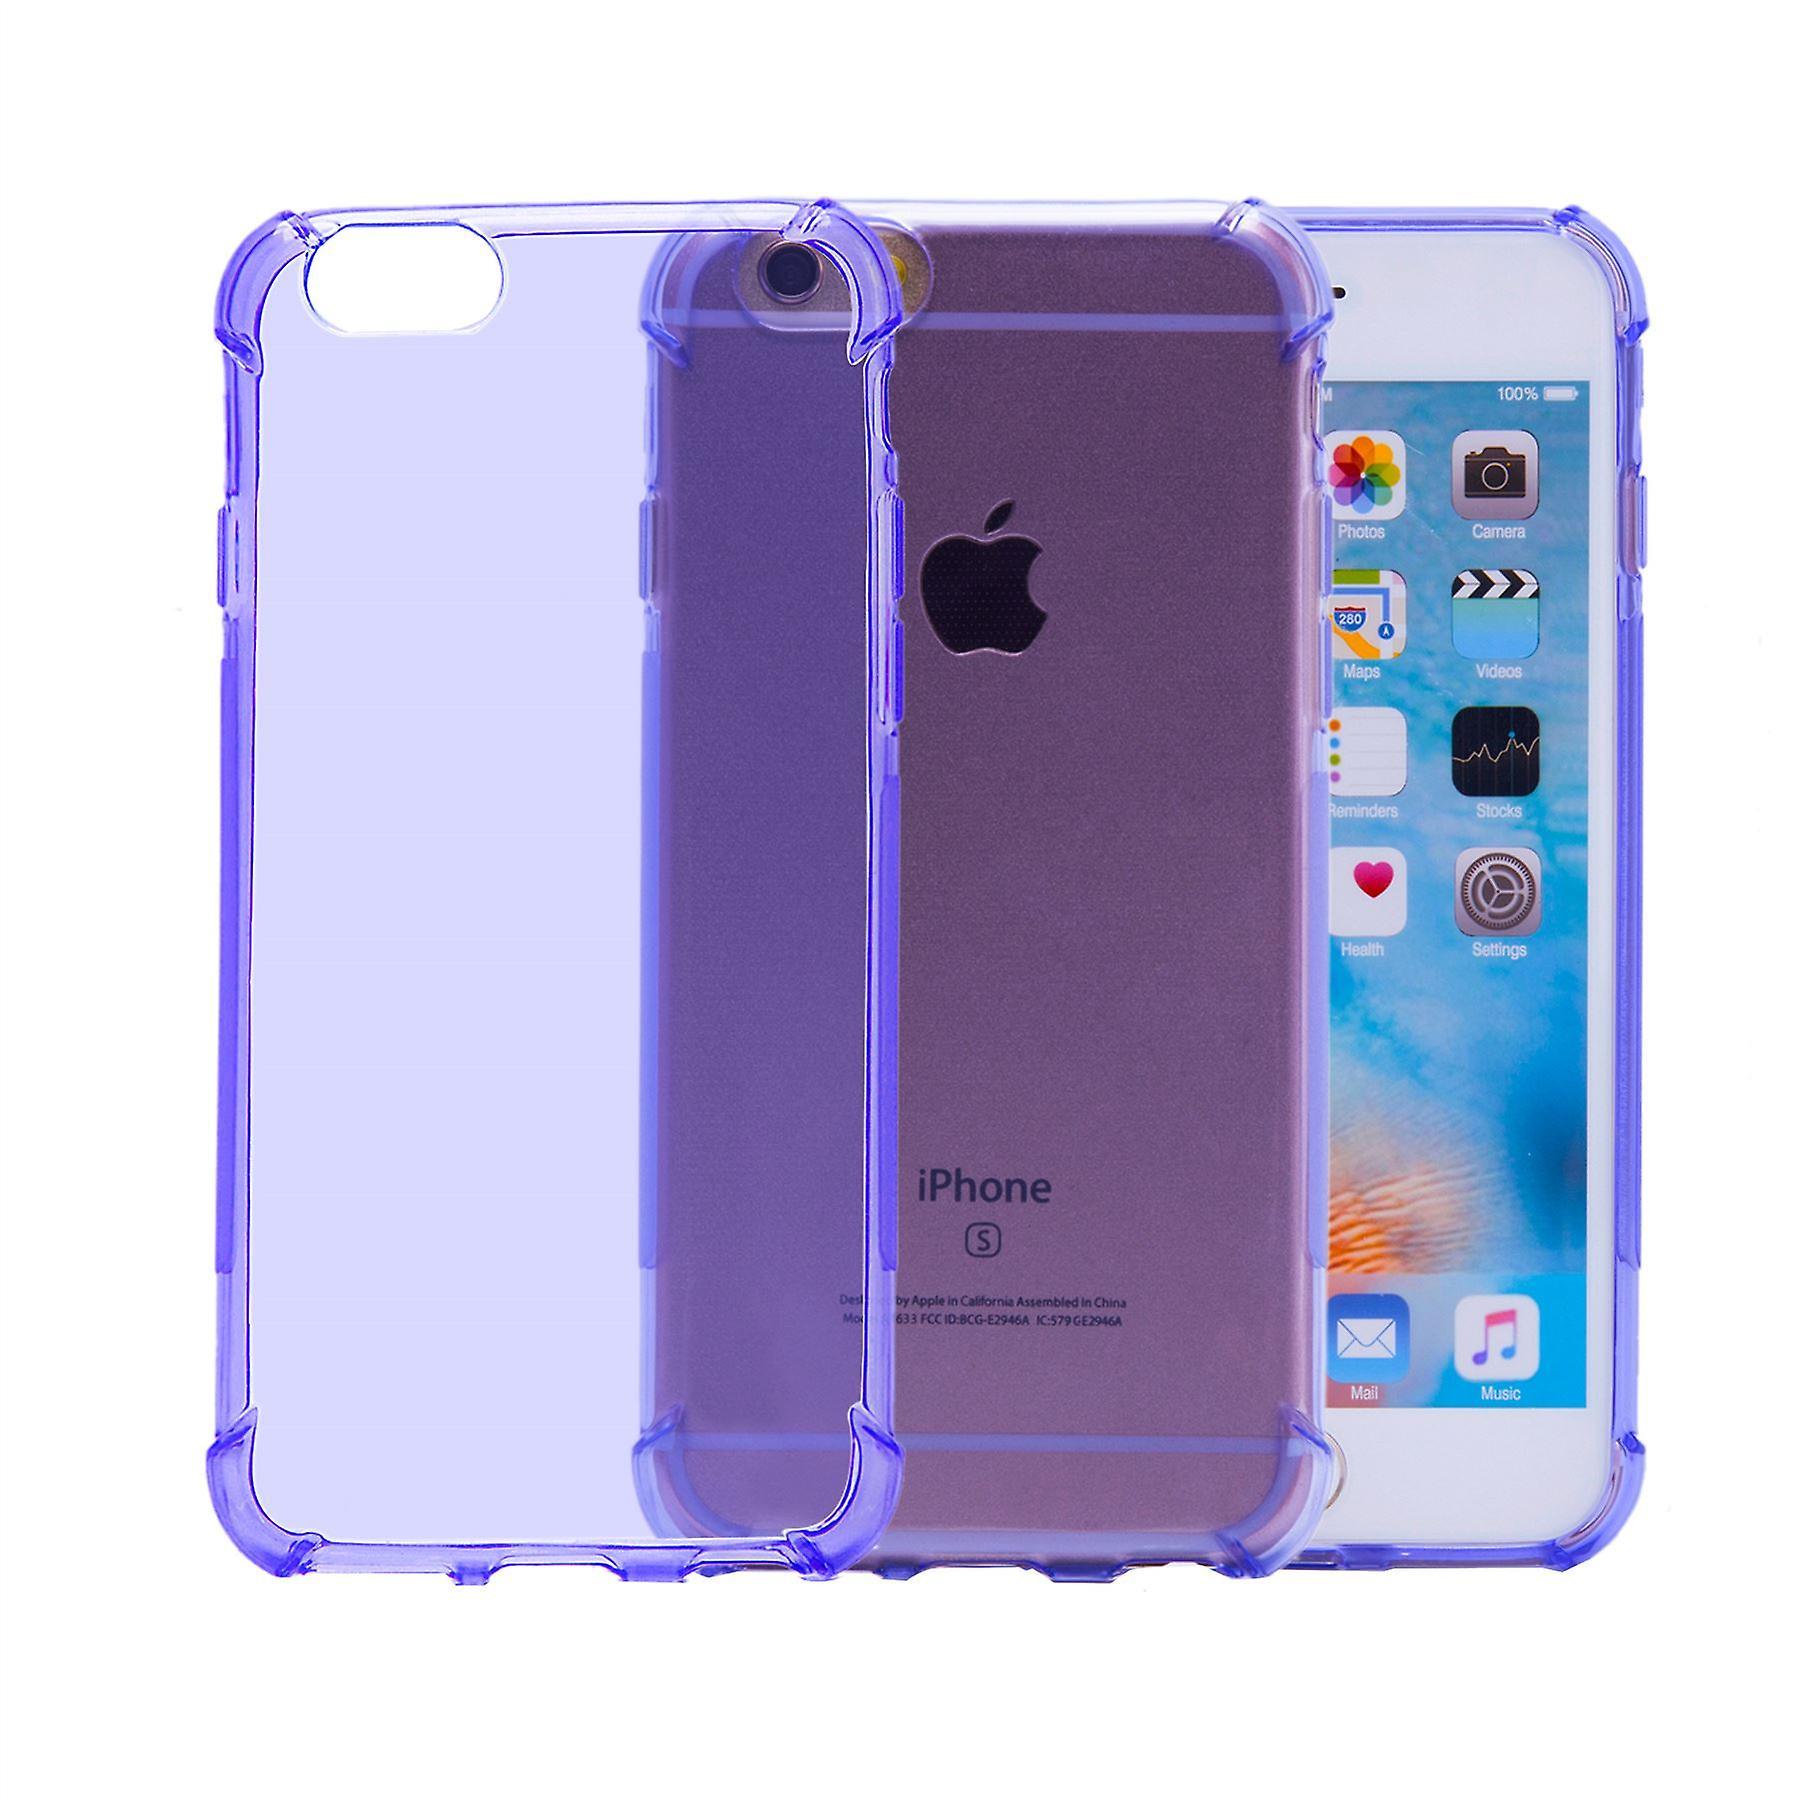 Tough Gel case for Apple iPhone 6 6S - Purple